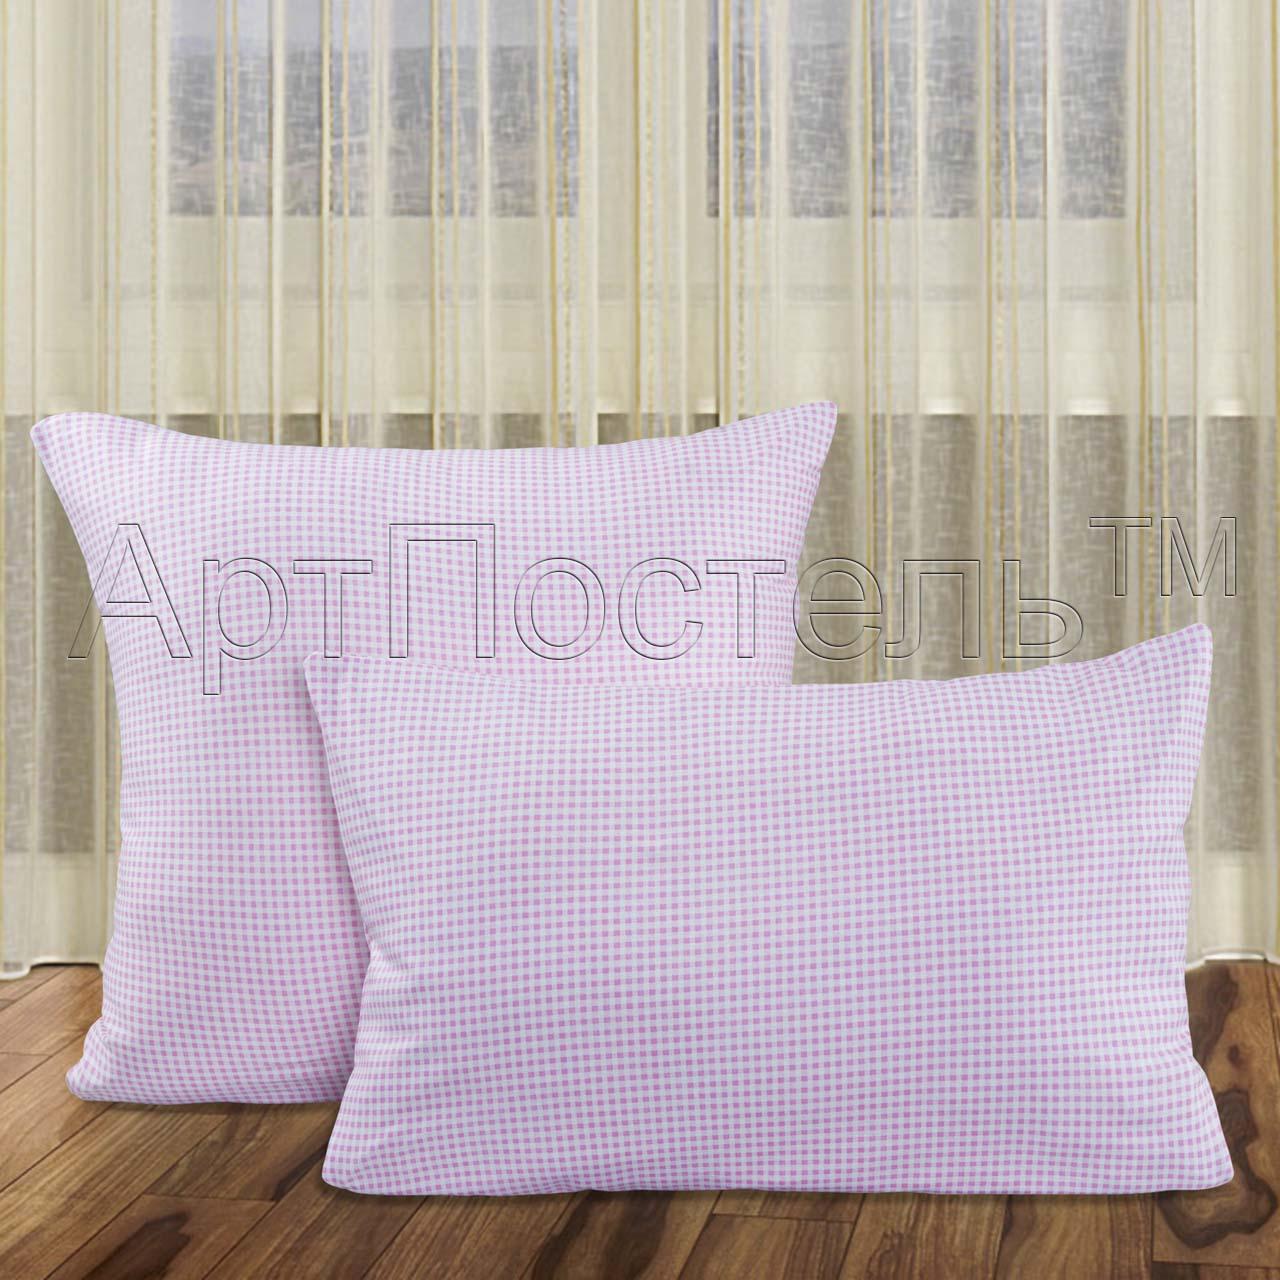 Наволочки Клетка Розовый, размер 70х70 смНаволочки<br>Плотность ткани:140 г/кв. м<br>Количество:2 шт.<br><br>Тип: Наволочки<br>Размер: 70х70<br>Материал: Кулирка